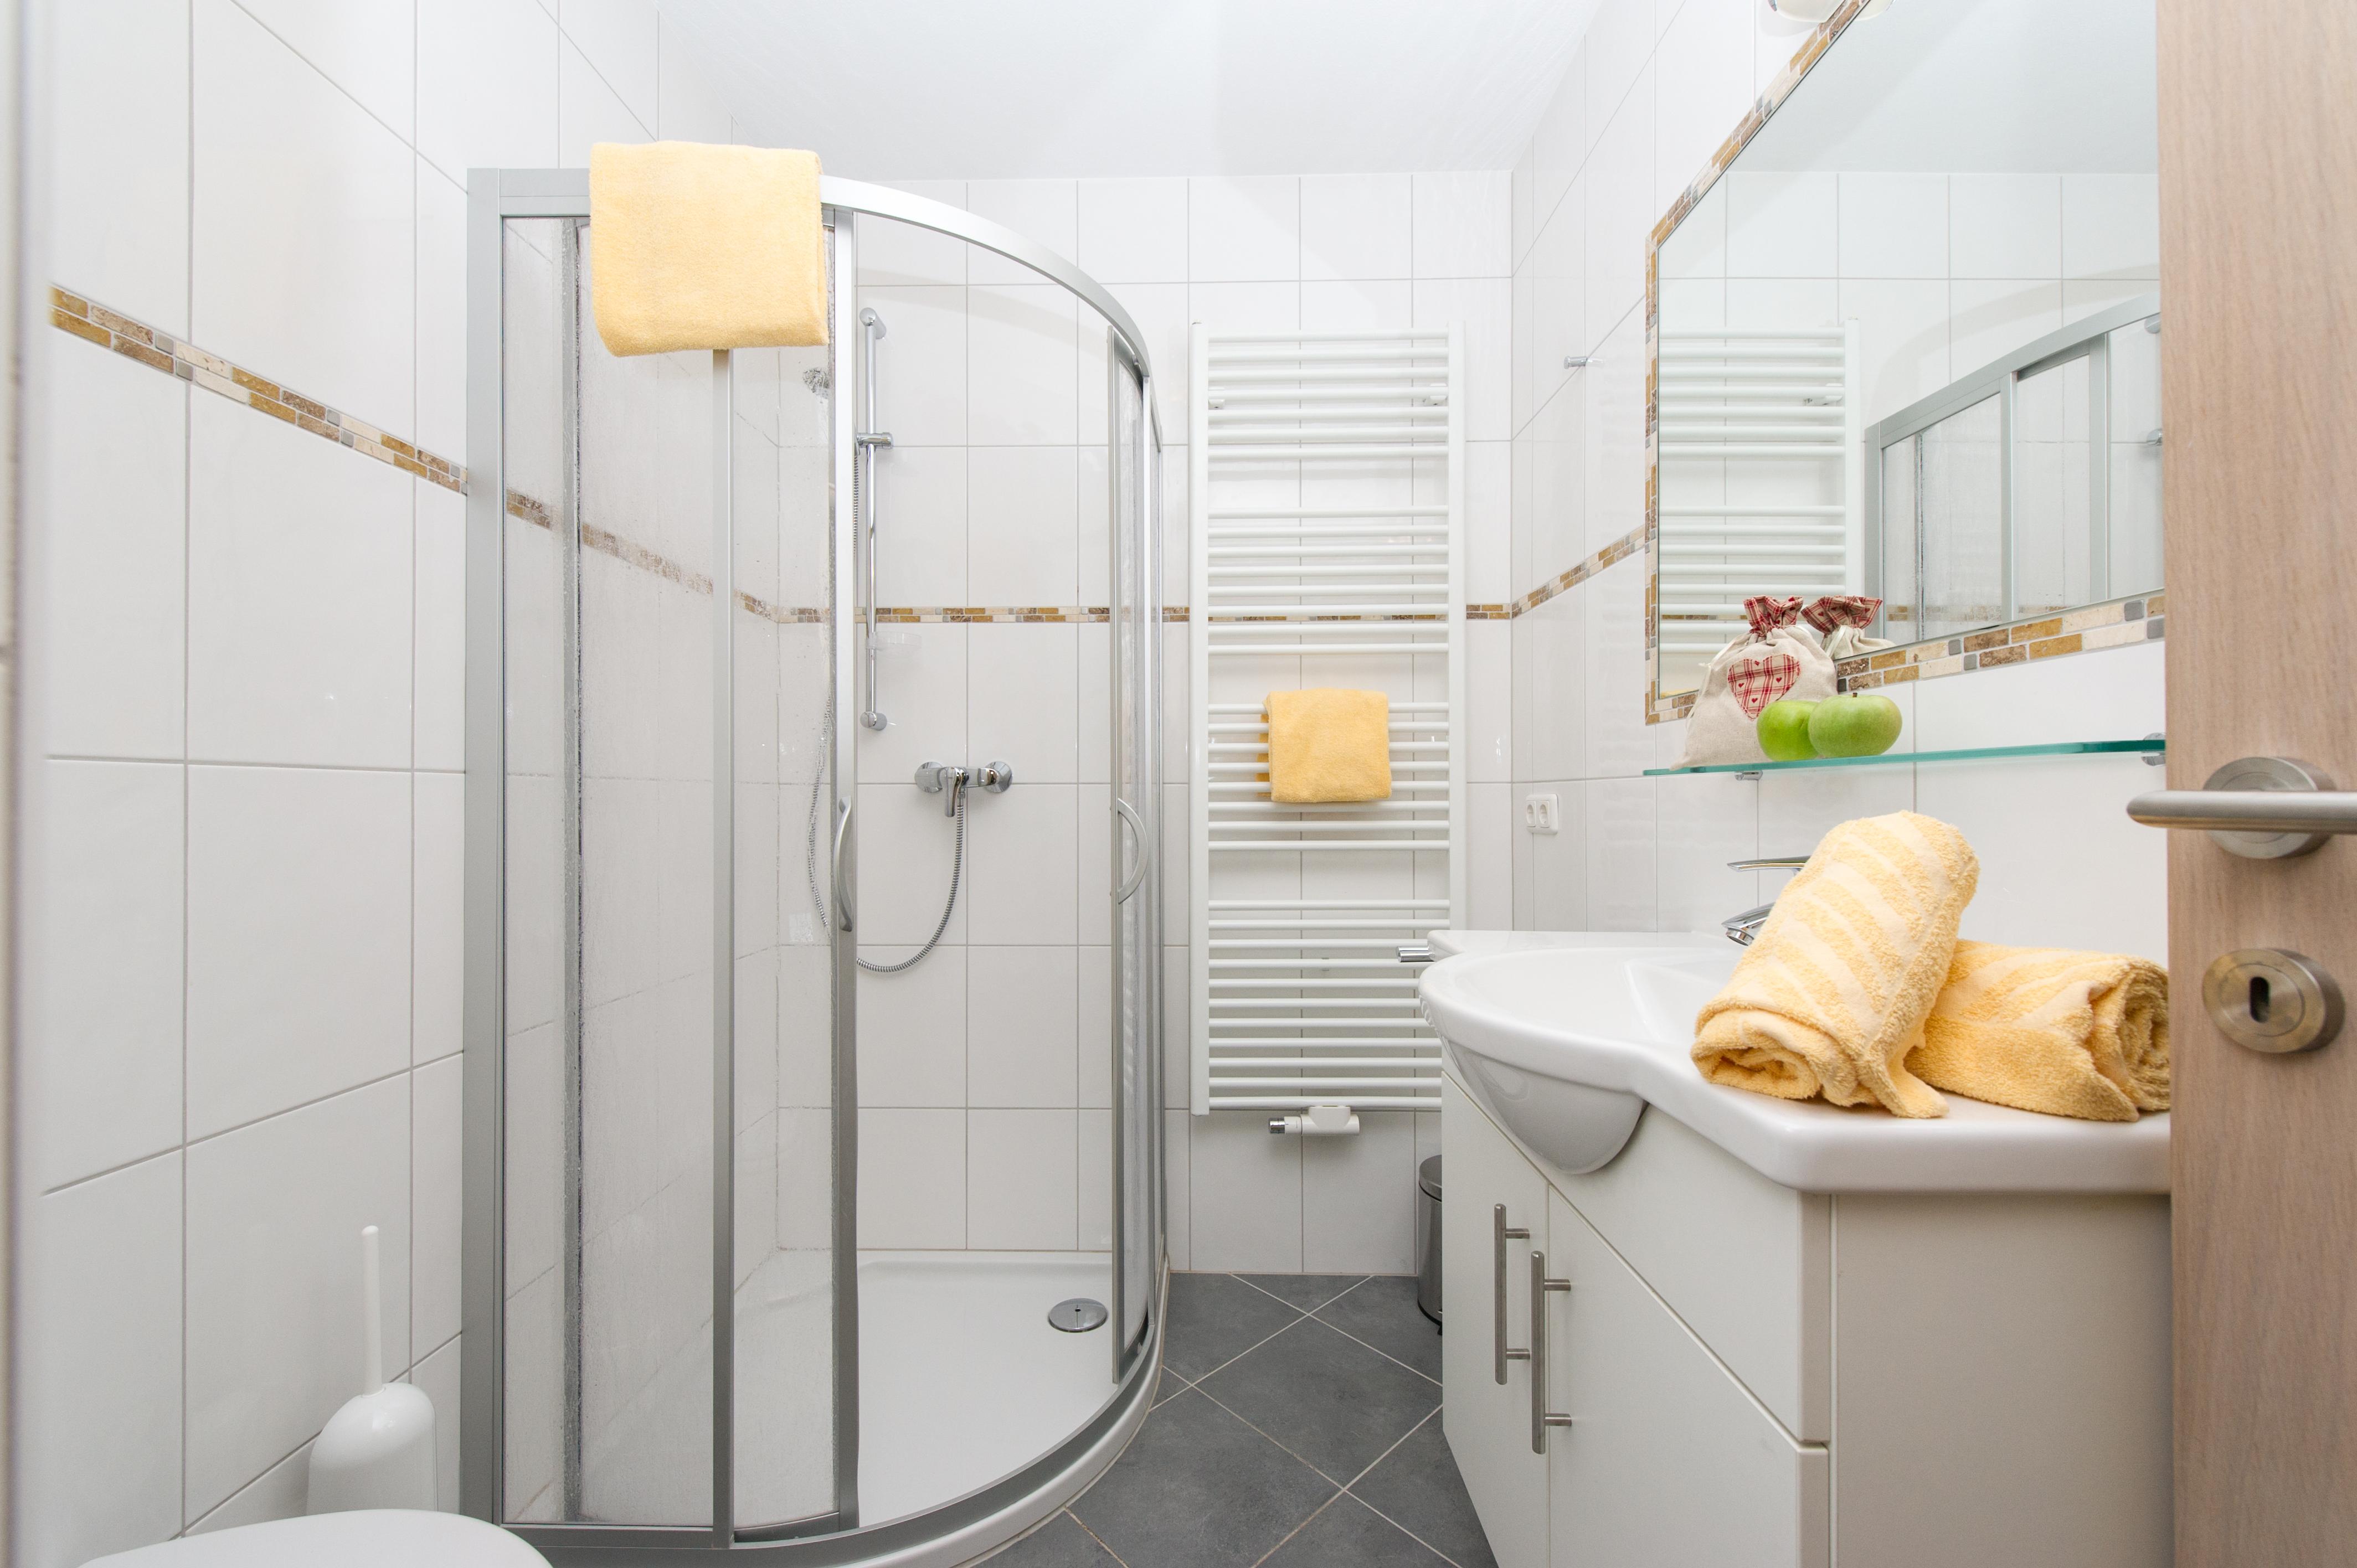 Top 2 Badezimmer